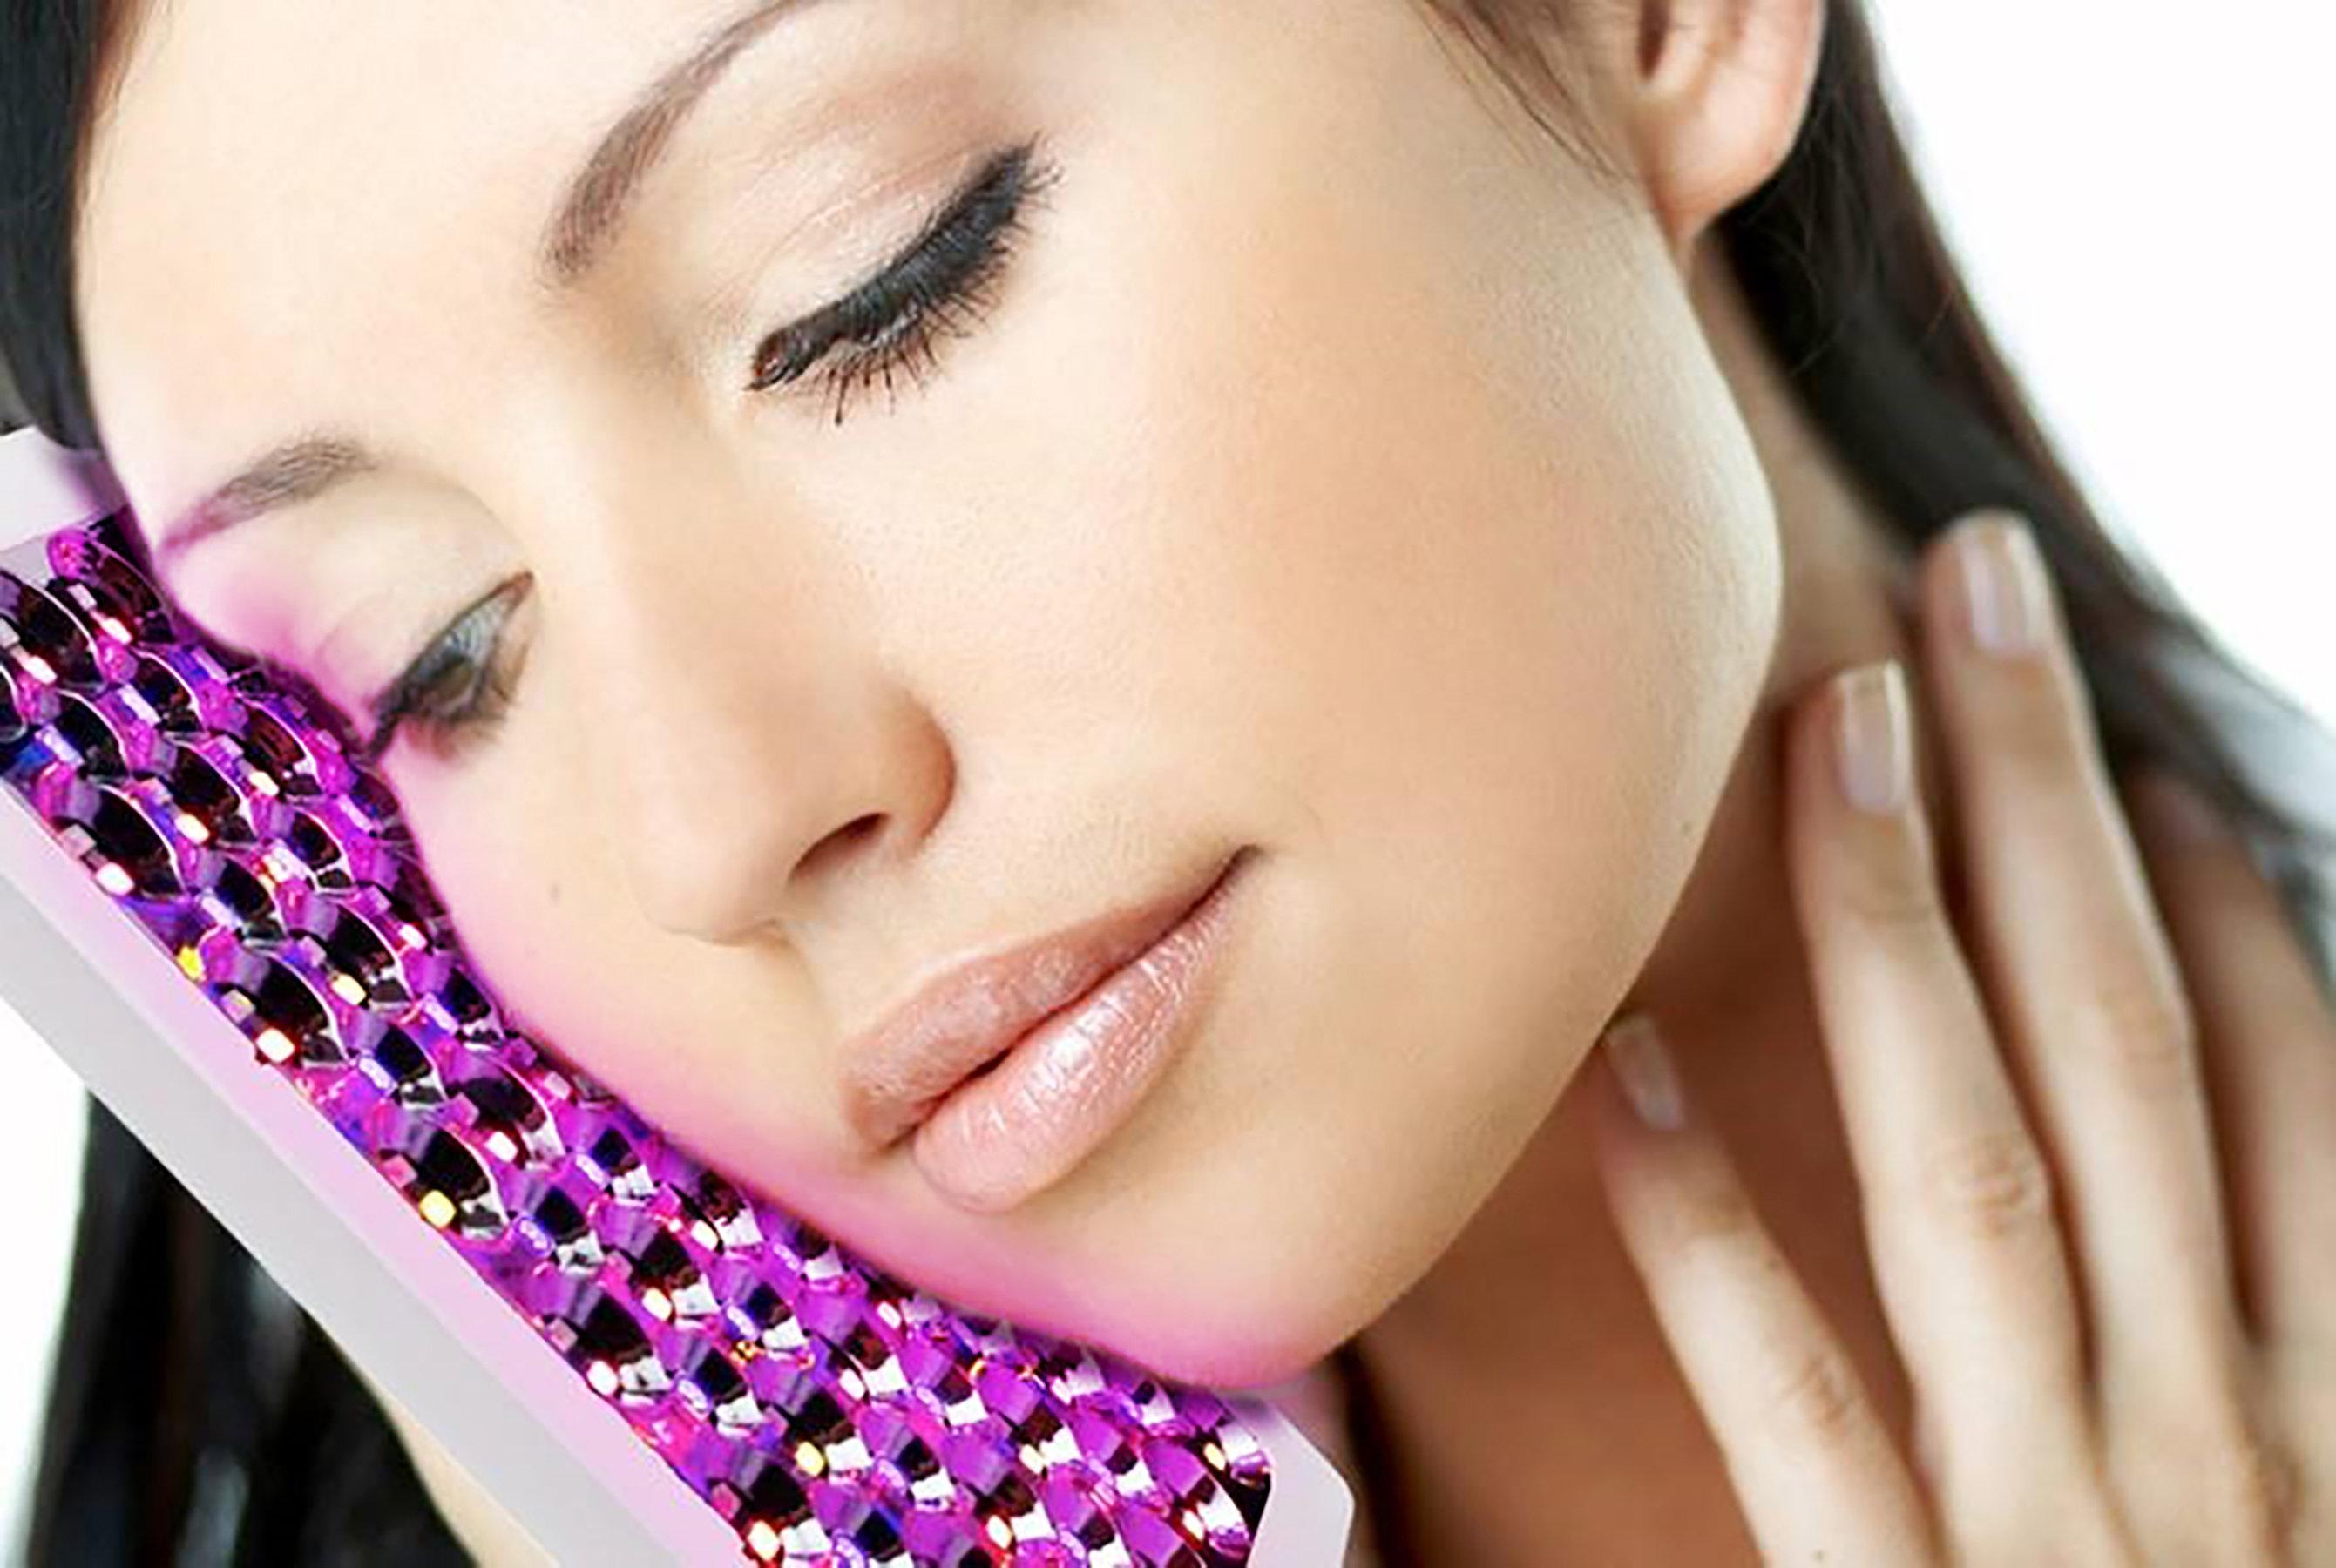 dpl IIa Bundle with dpl Teeth Whitening System